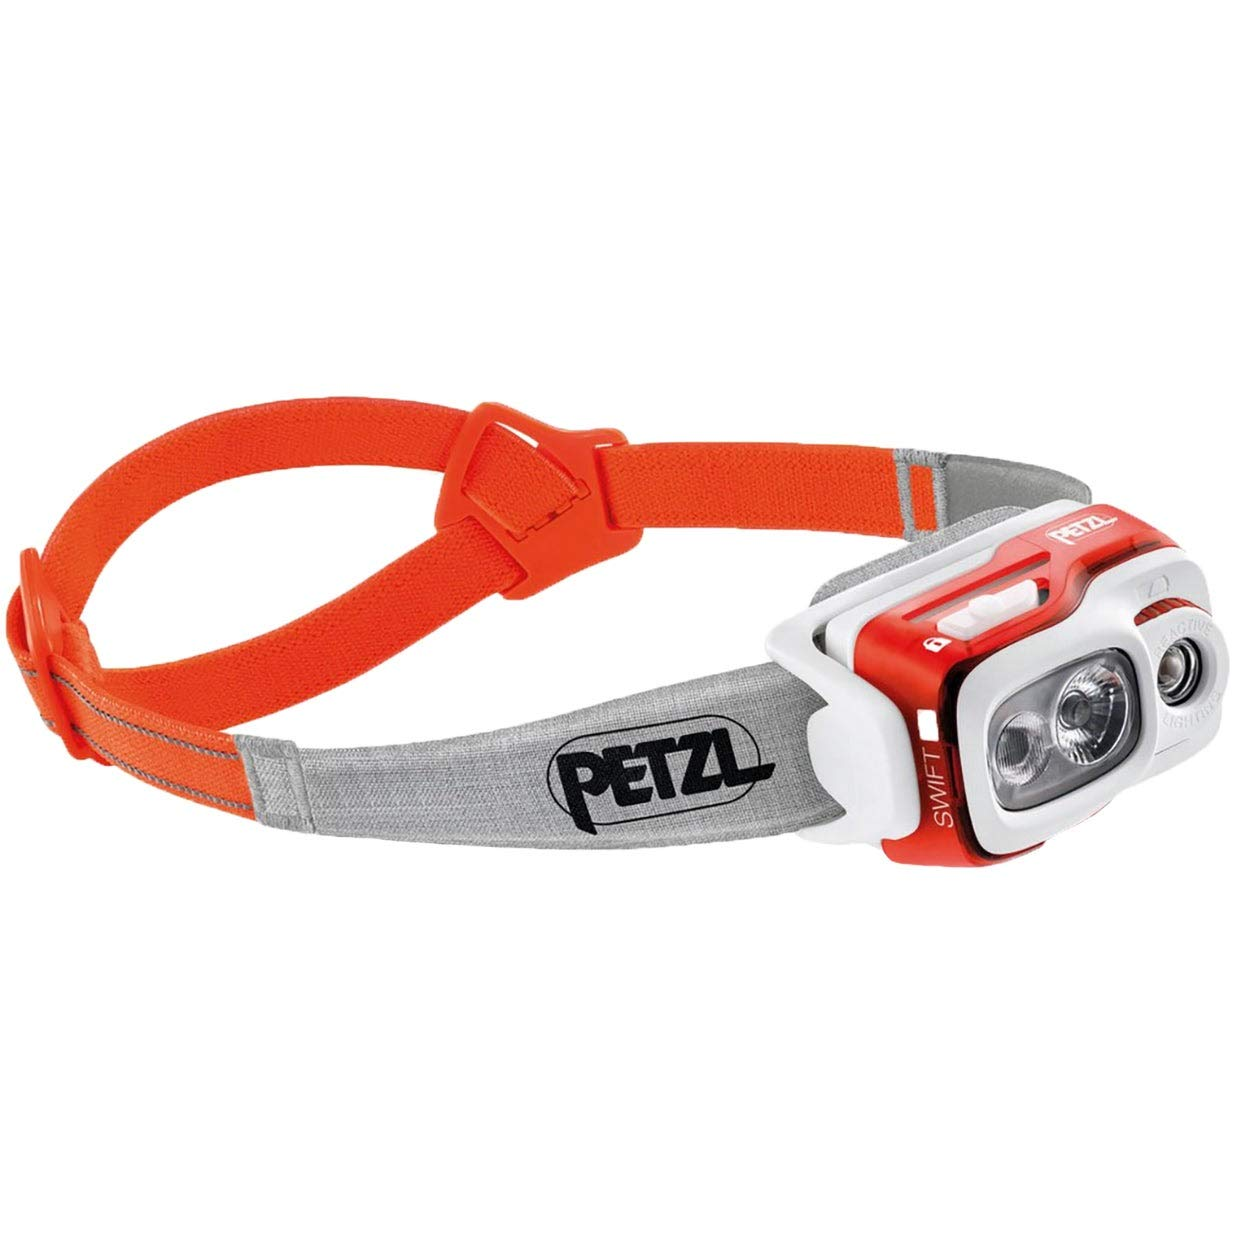 Petzl Swift Rl Multi-Beam Headlamp Orange One Size by PETZL